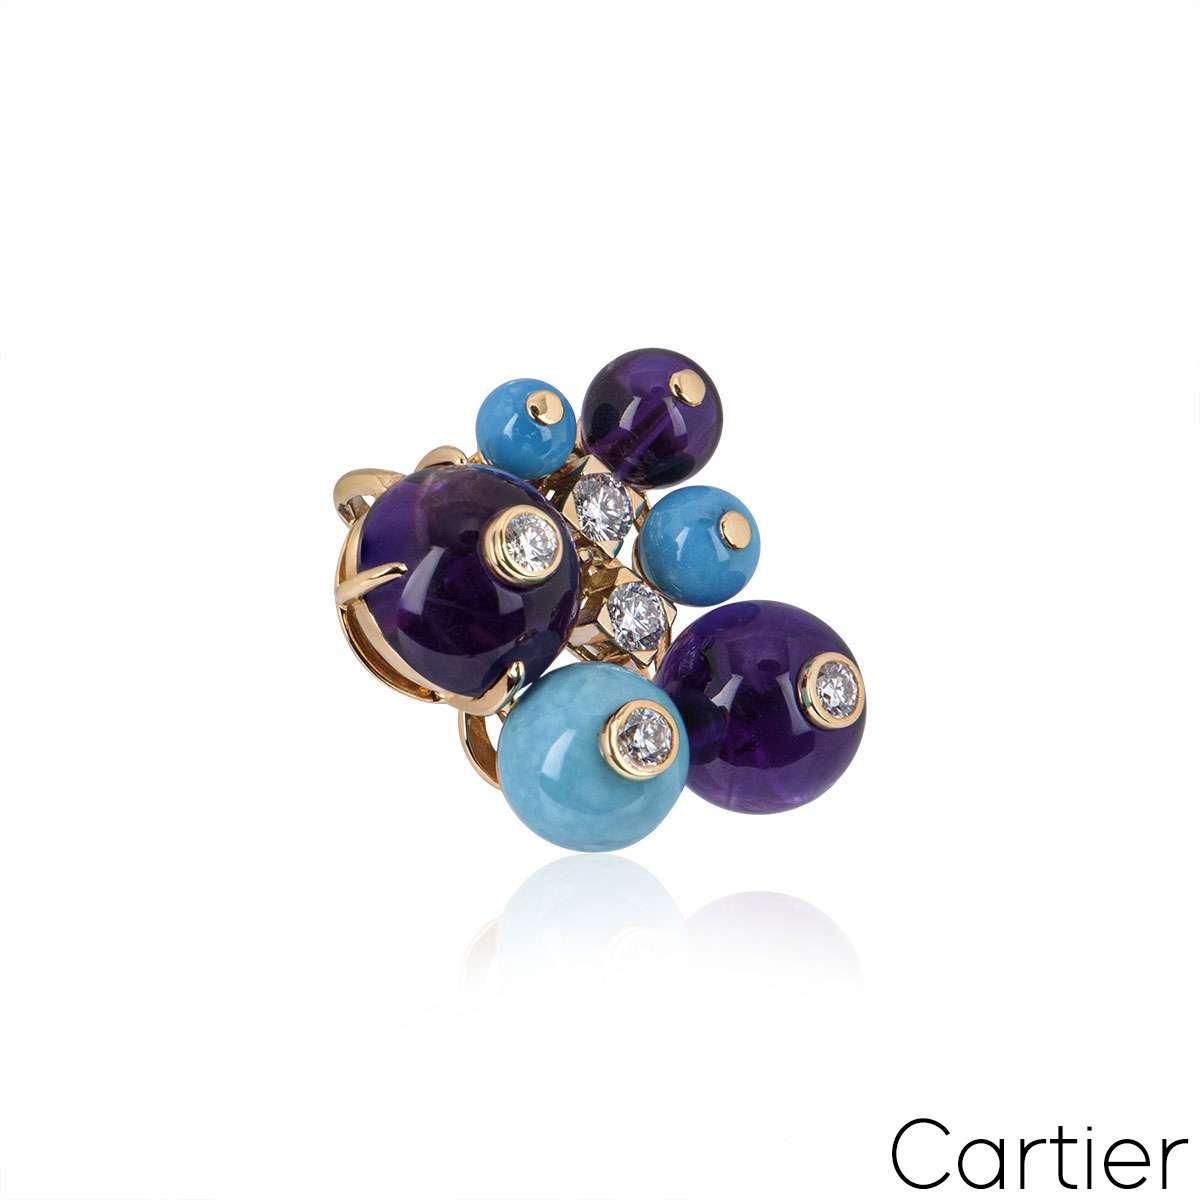 Cartier Rose Gold Delices De Goa Pendant